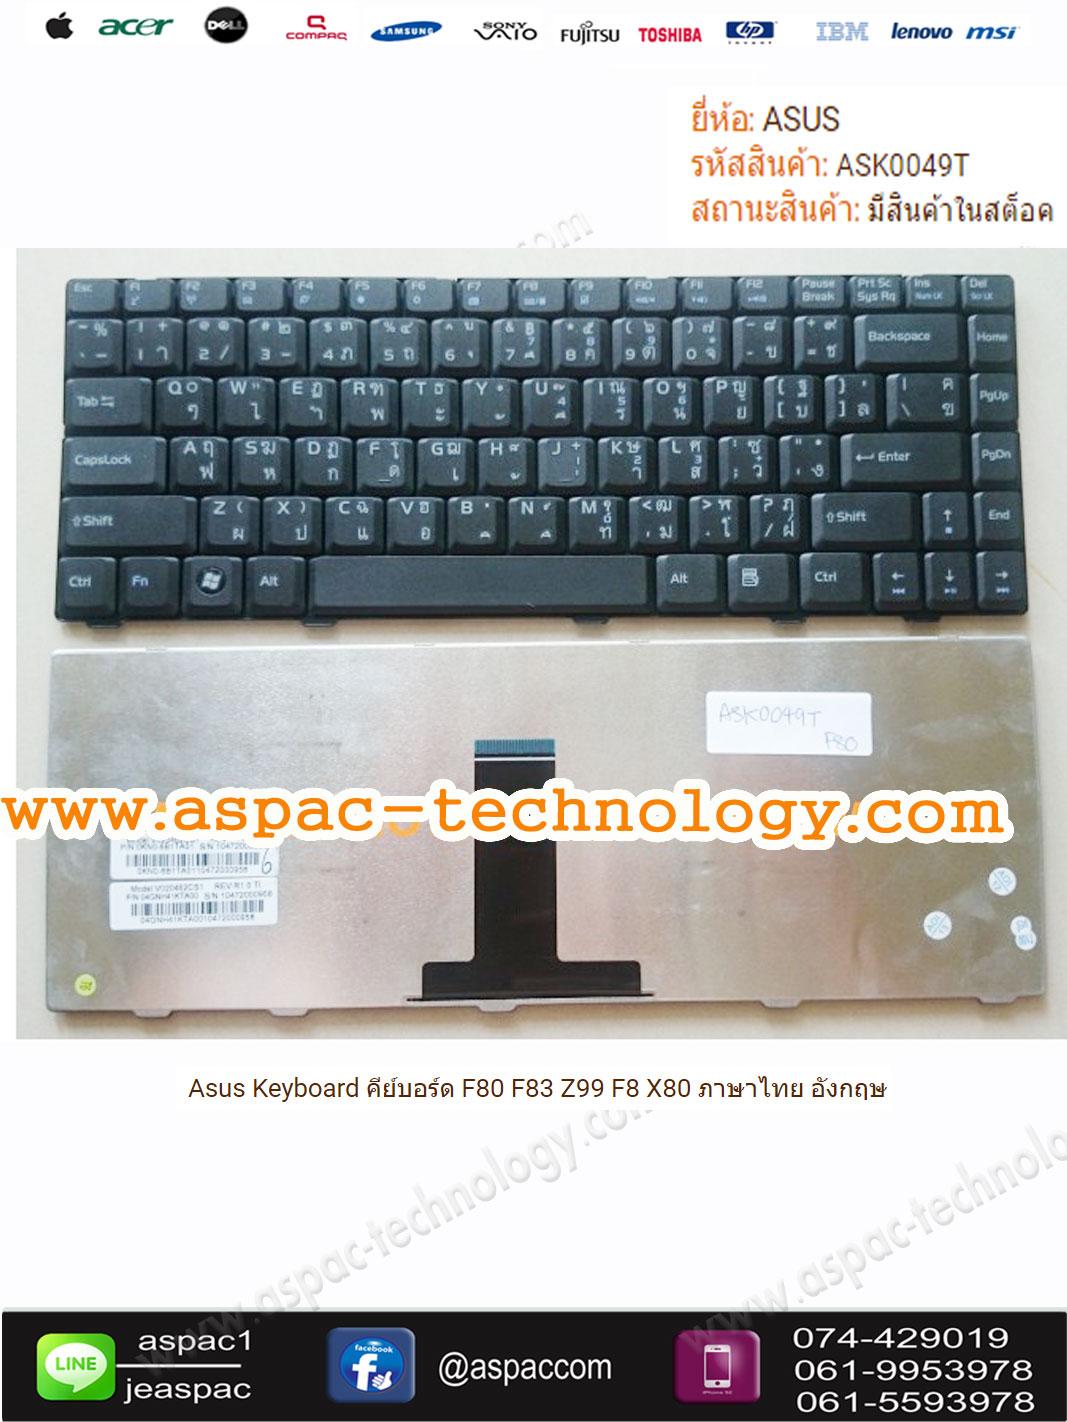 Asus Keyboard คีย์บอร์ด F80 F83 Z99 F8 X80 ภาษาไทย อังกฤษ